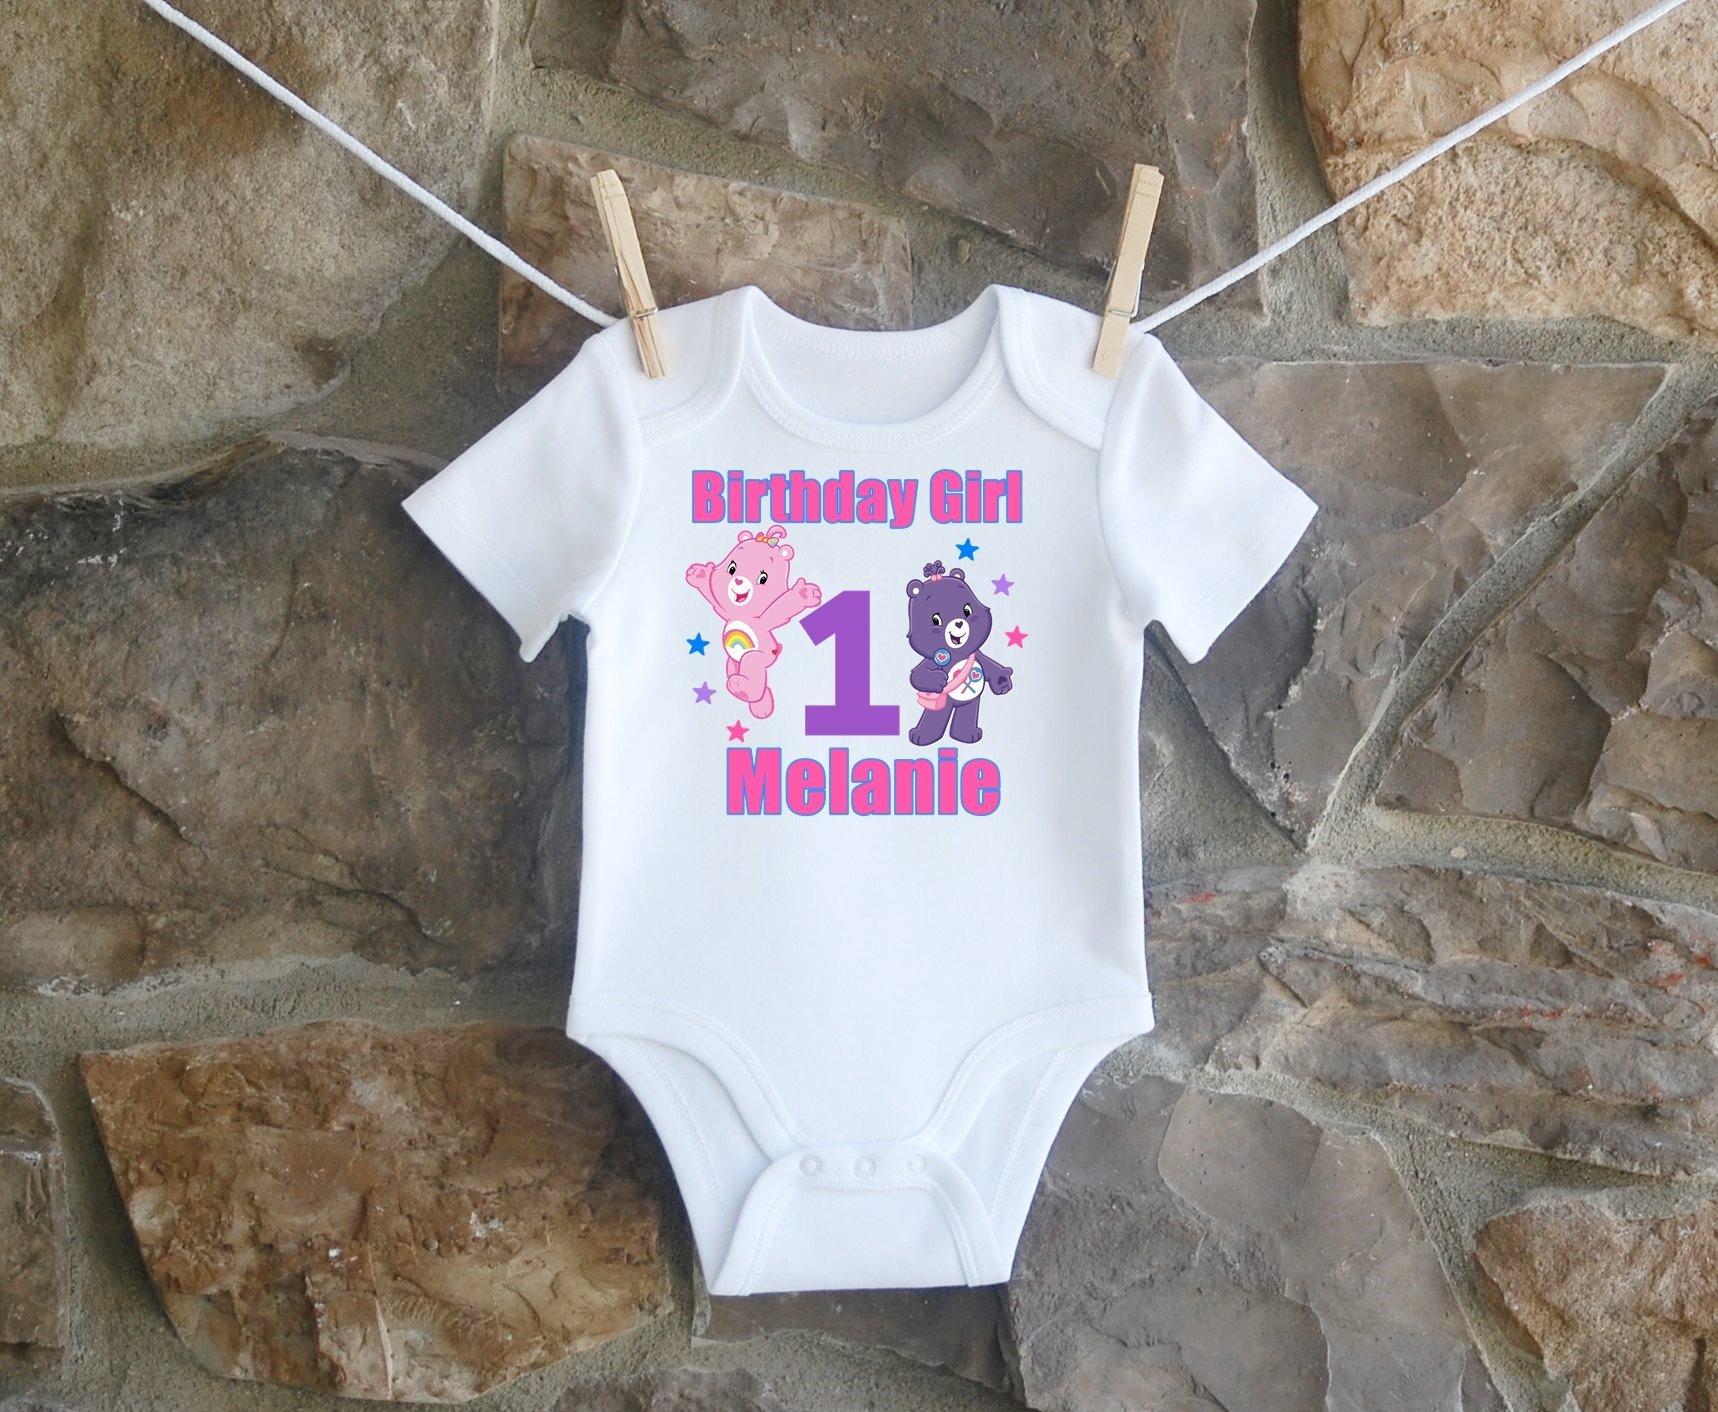 CareBears Birthday Shirt, CareBears Birthday Shirt For Girls, Personalized Girls CareBears Birthday Shirt, Customized Care Bears Birthday Shirt